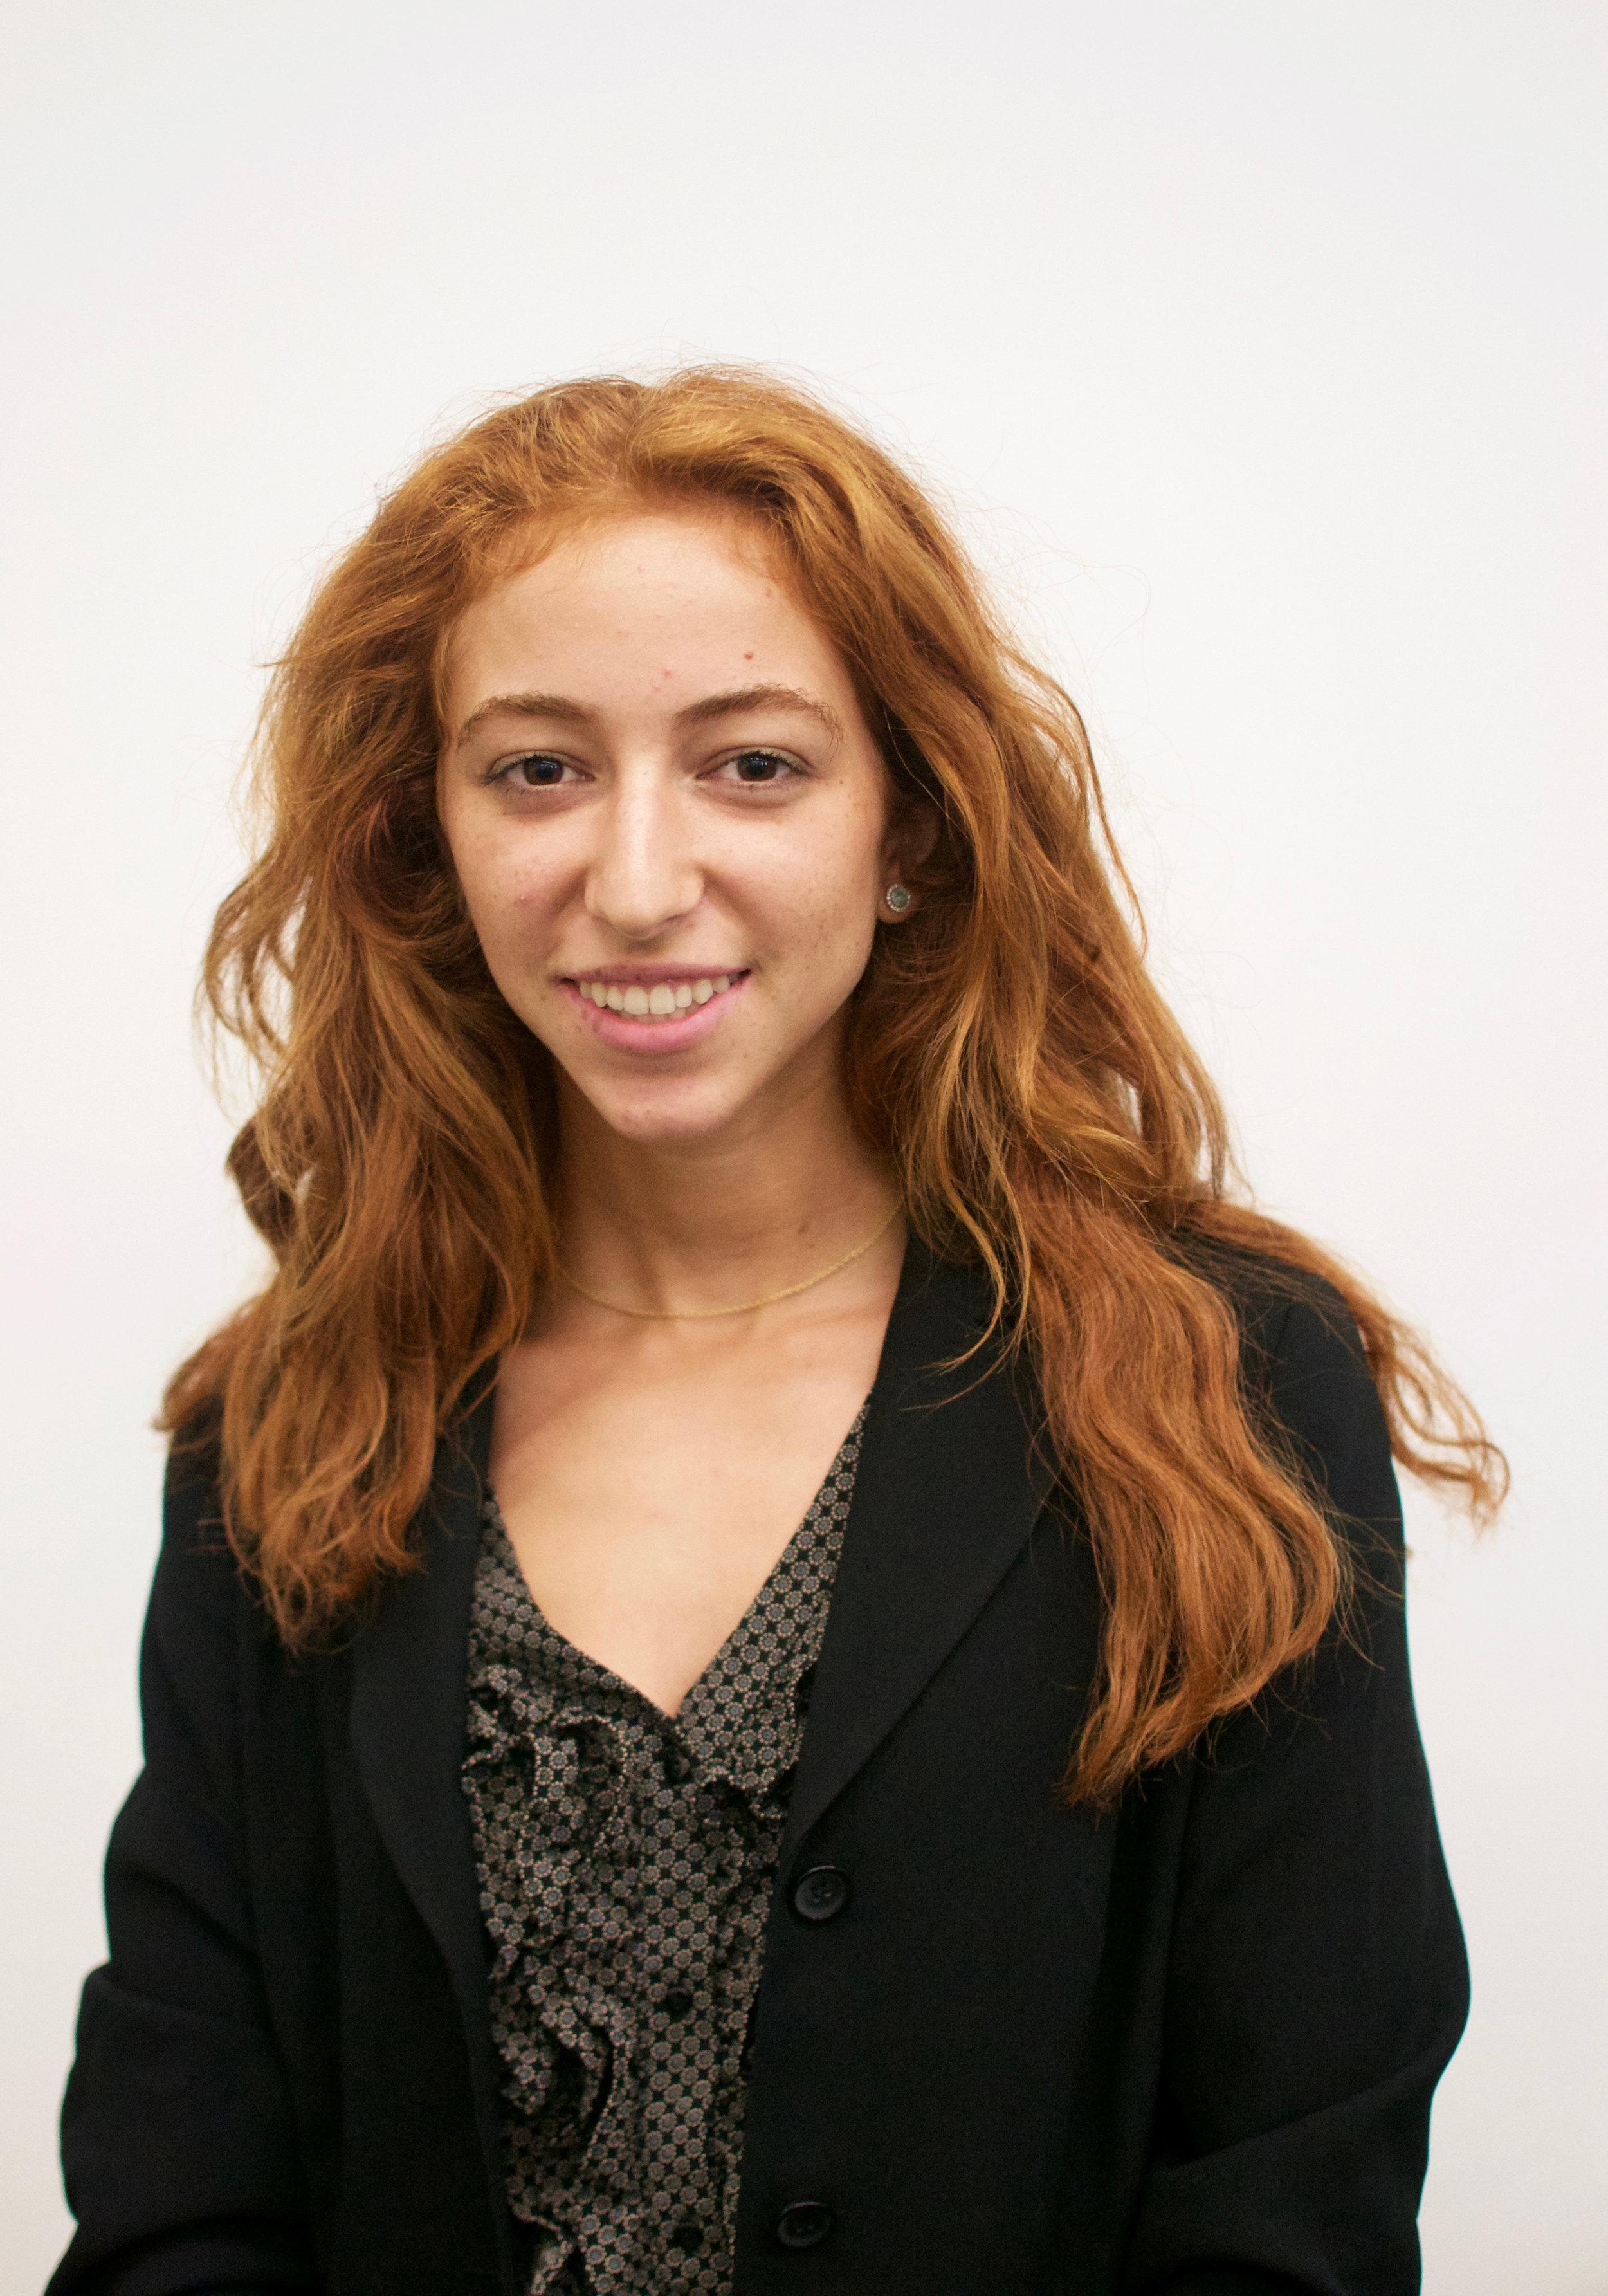 Isabella Revel